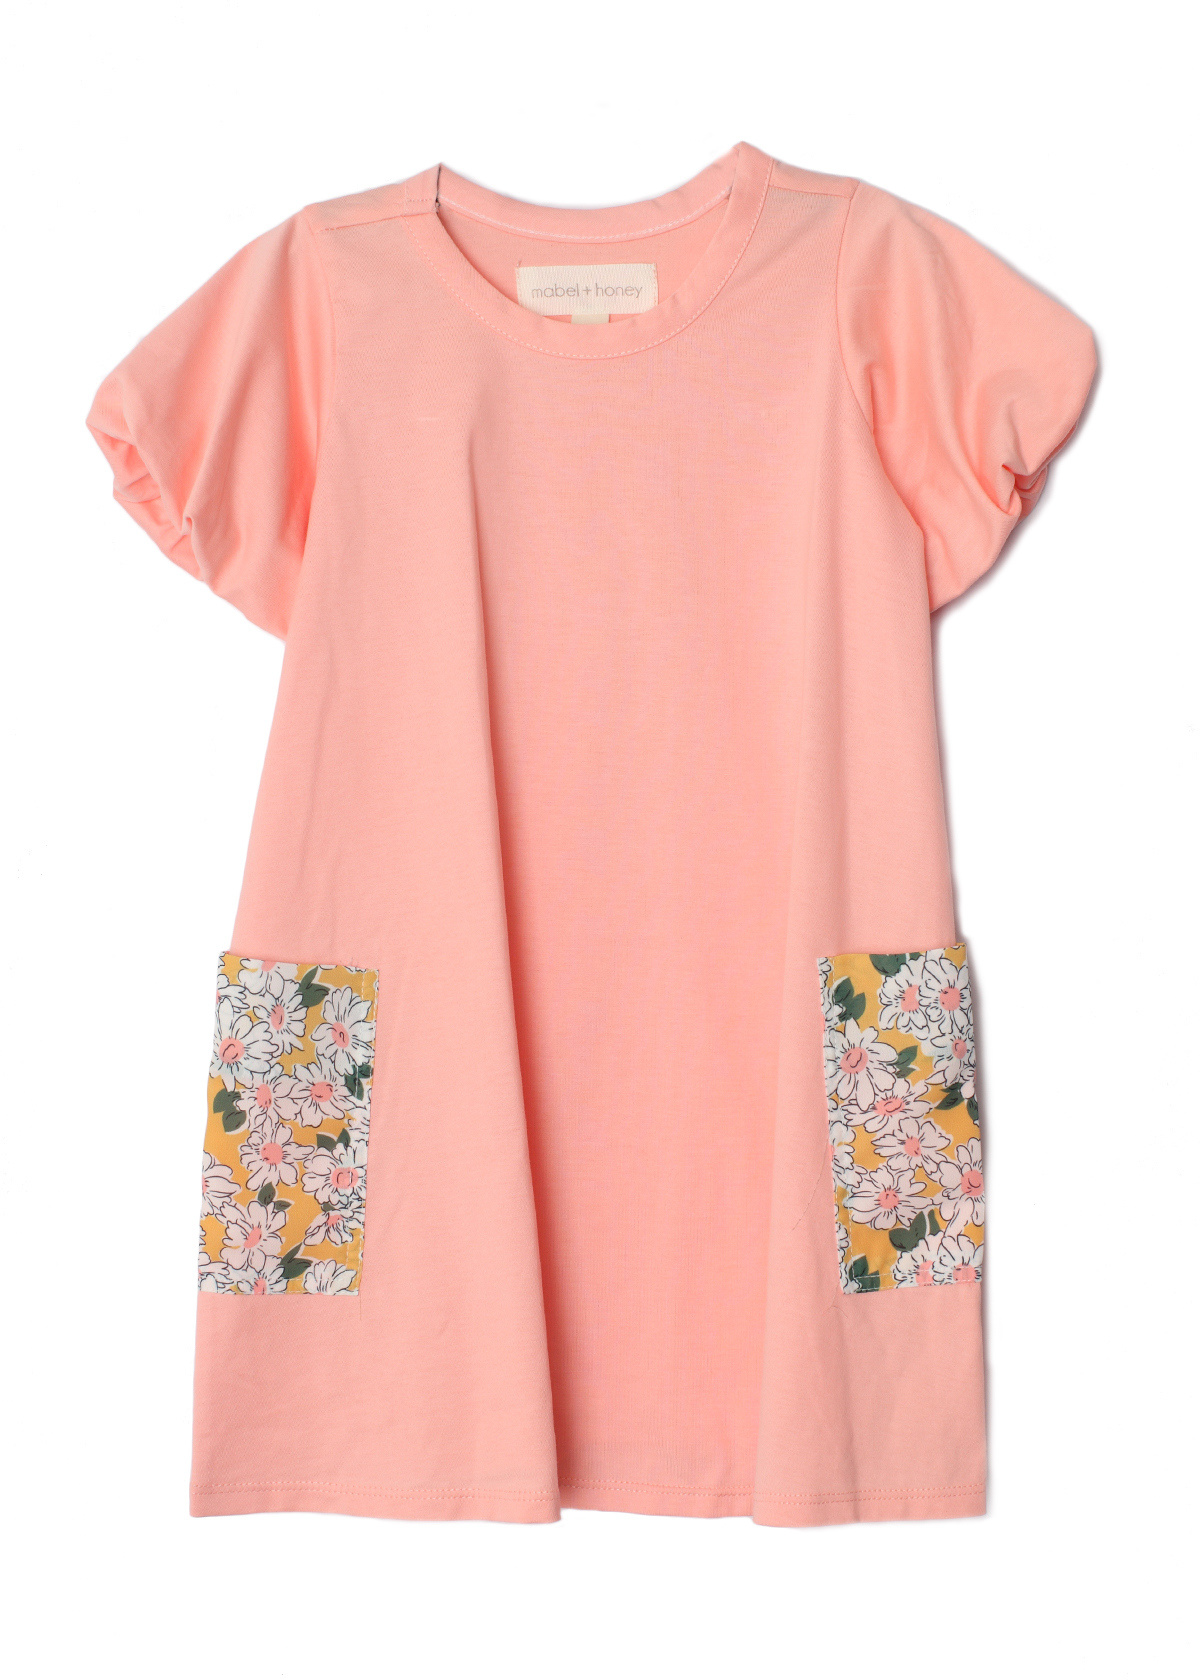 Mabel + Honey Natural Breeze Pink Dress